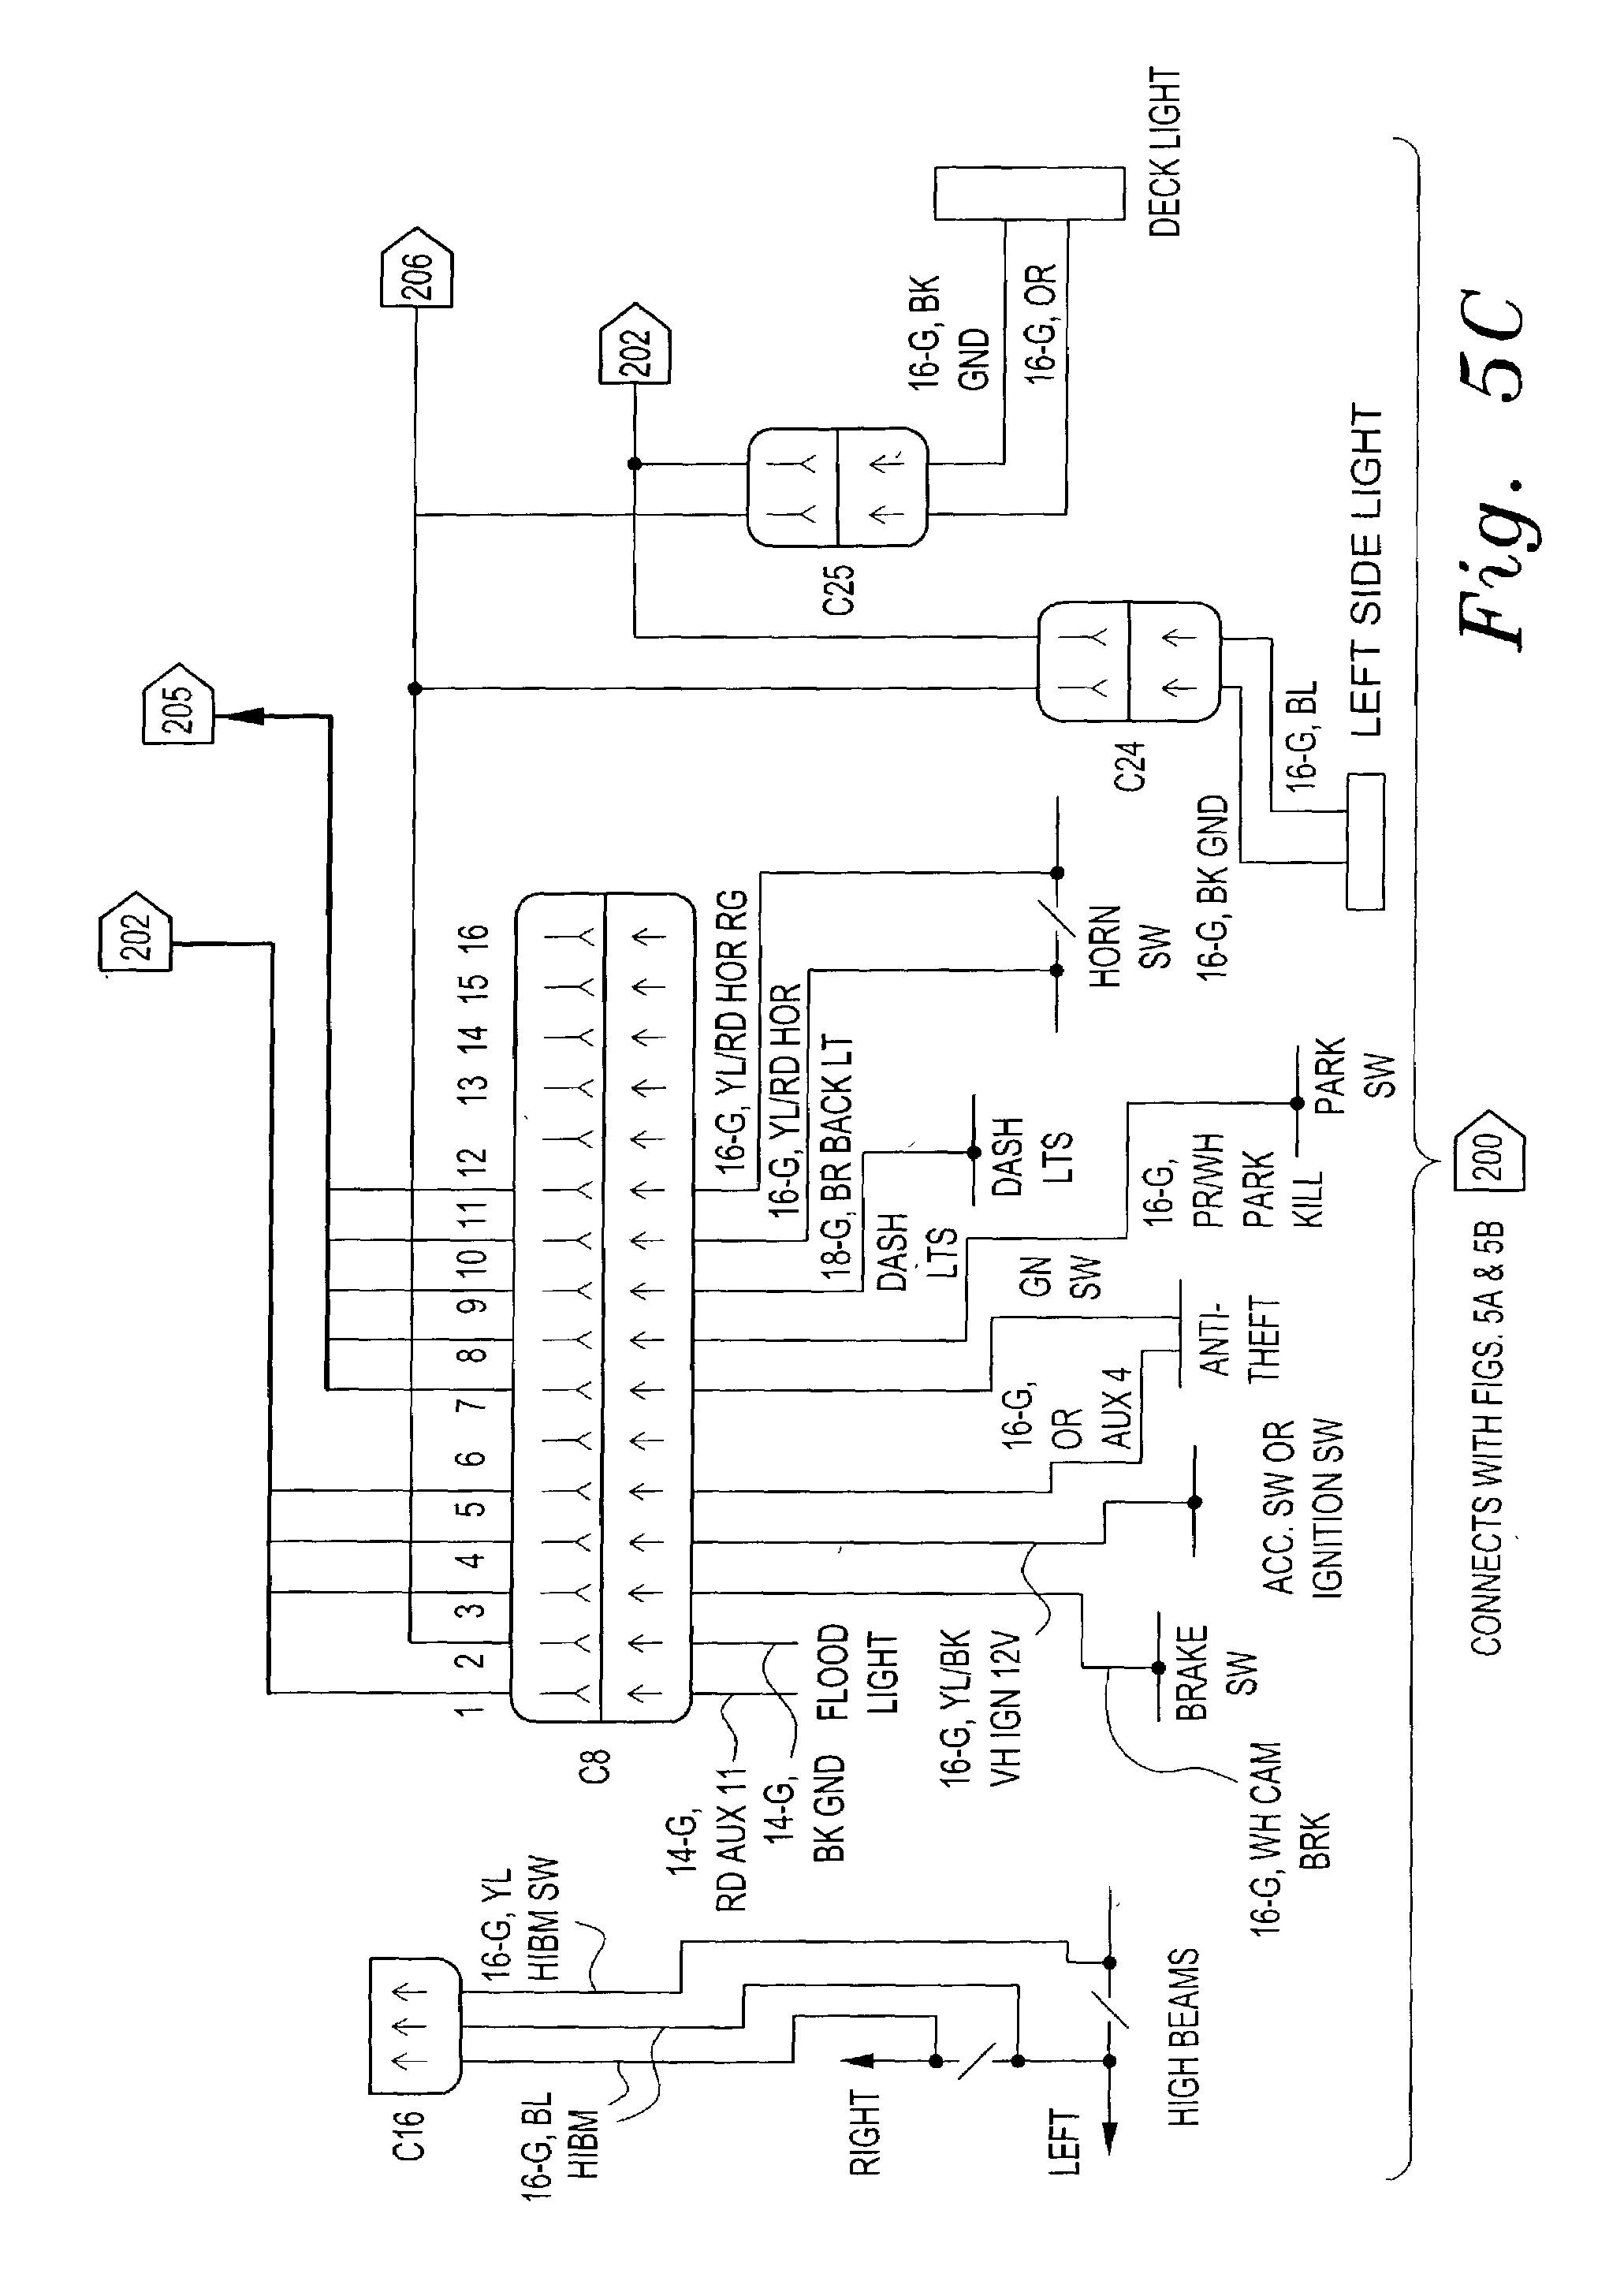 Whelen Siren 295hfsa1 Wiring Diagram 6 Cylinder Ford Industrial Engine Wiring Diagram Bege Doe1 Au Delice Limousin Fr